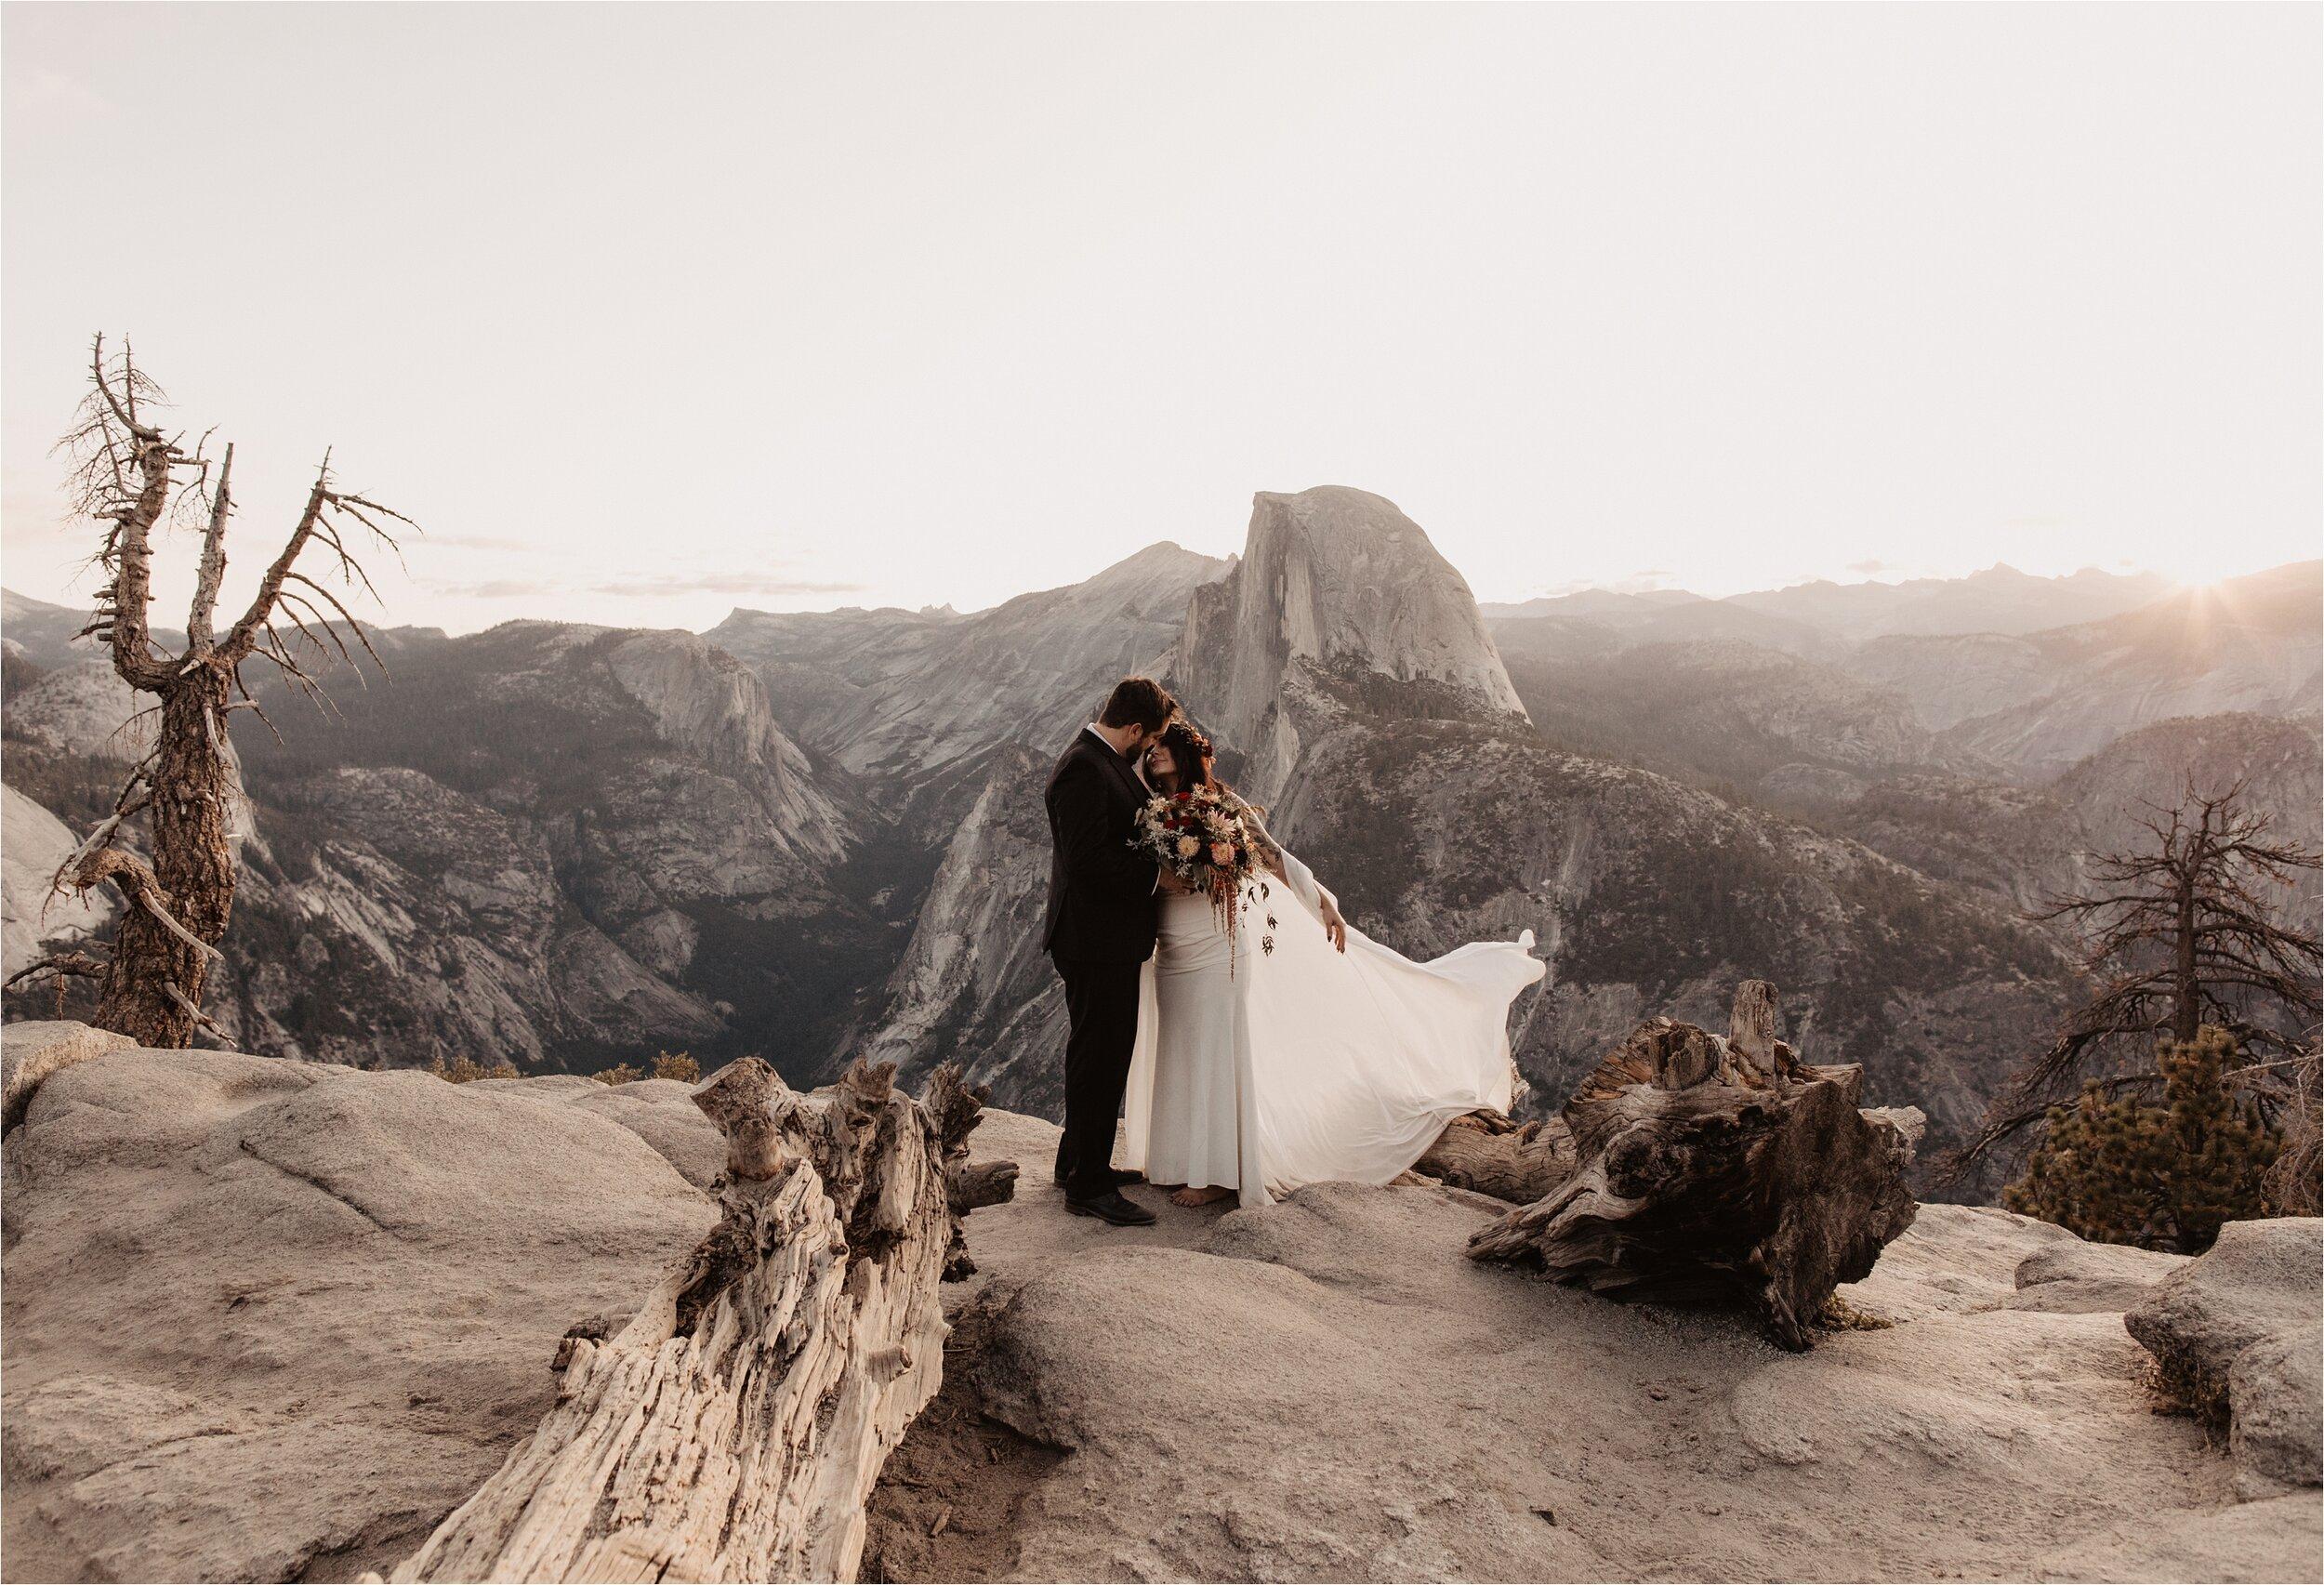 glacier-point-yosemite-elopement-ceremony_0021.jpg